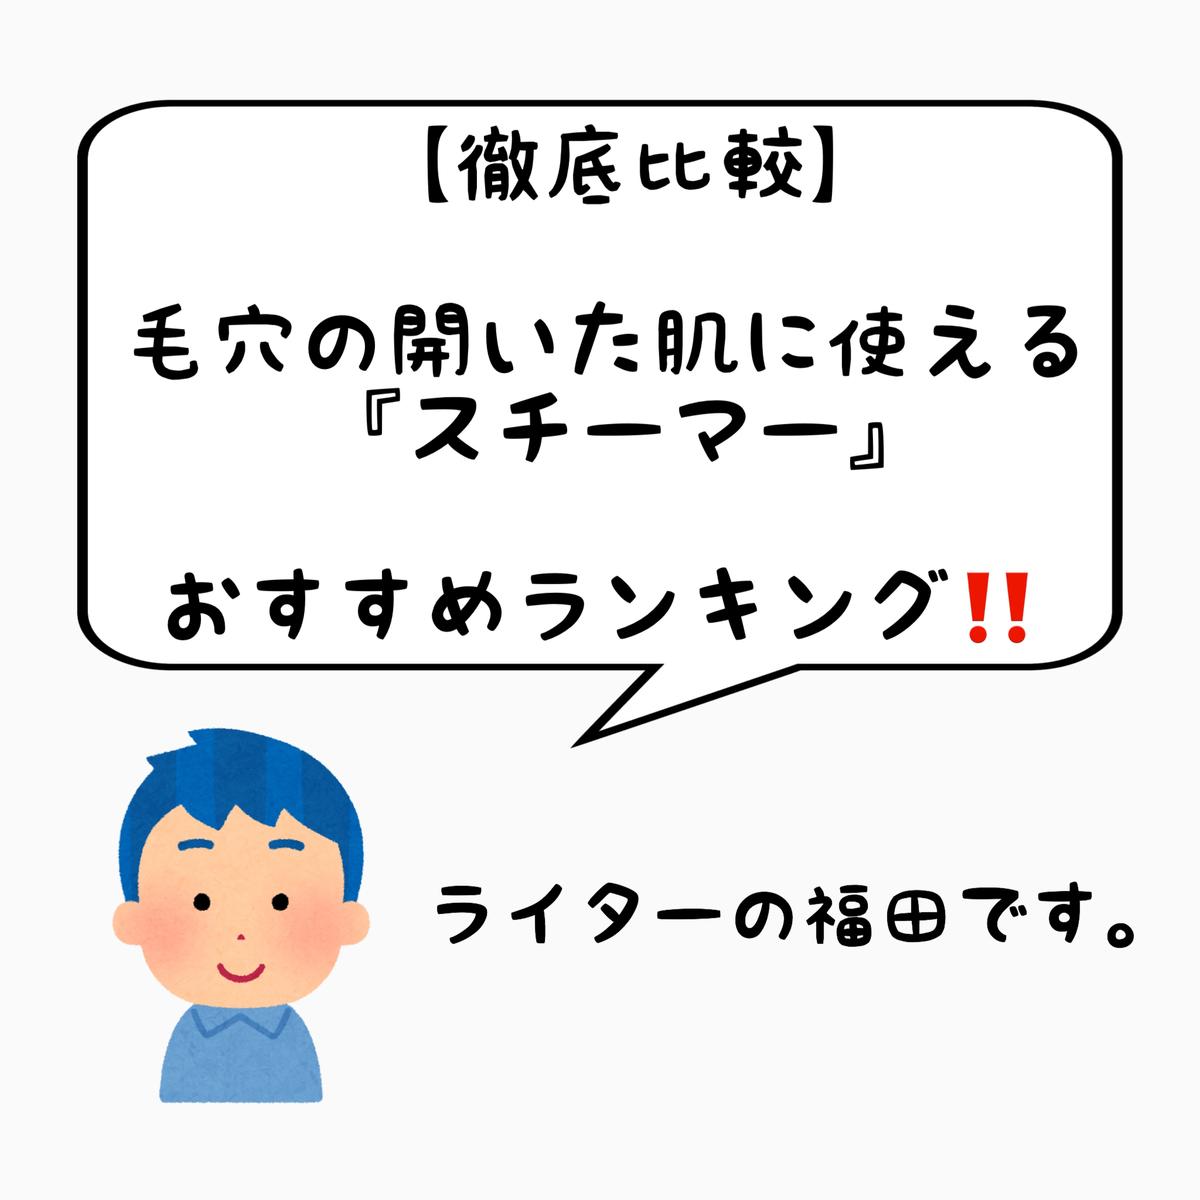 f:id:nokonoko_o:20201203171141j:plain